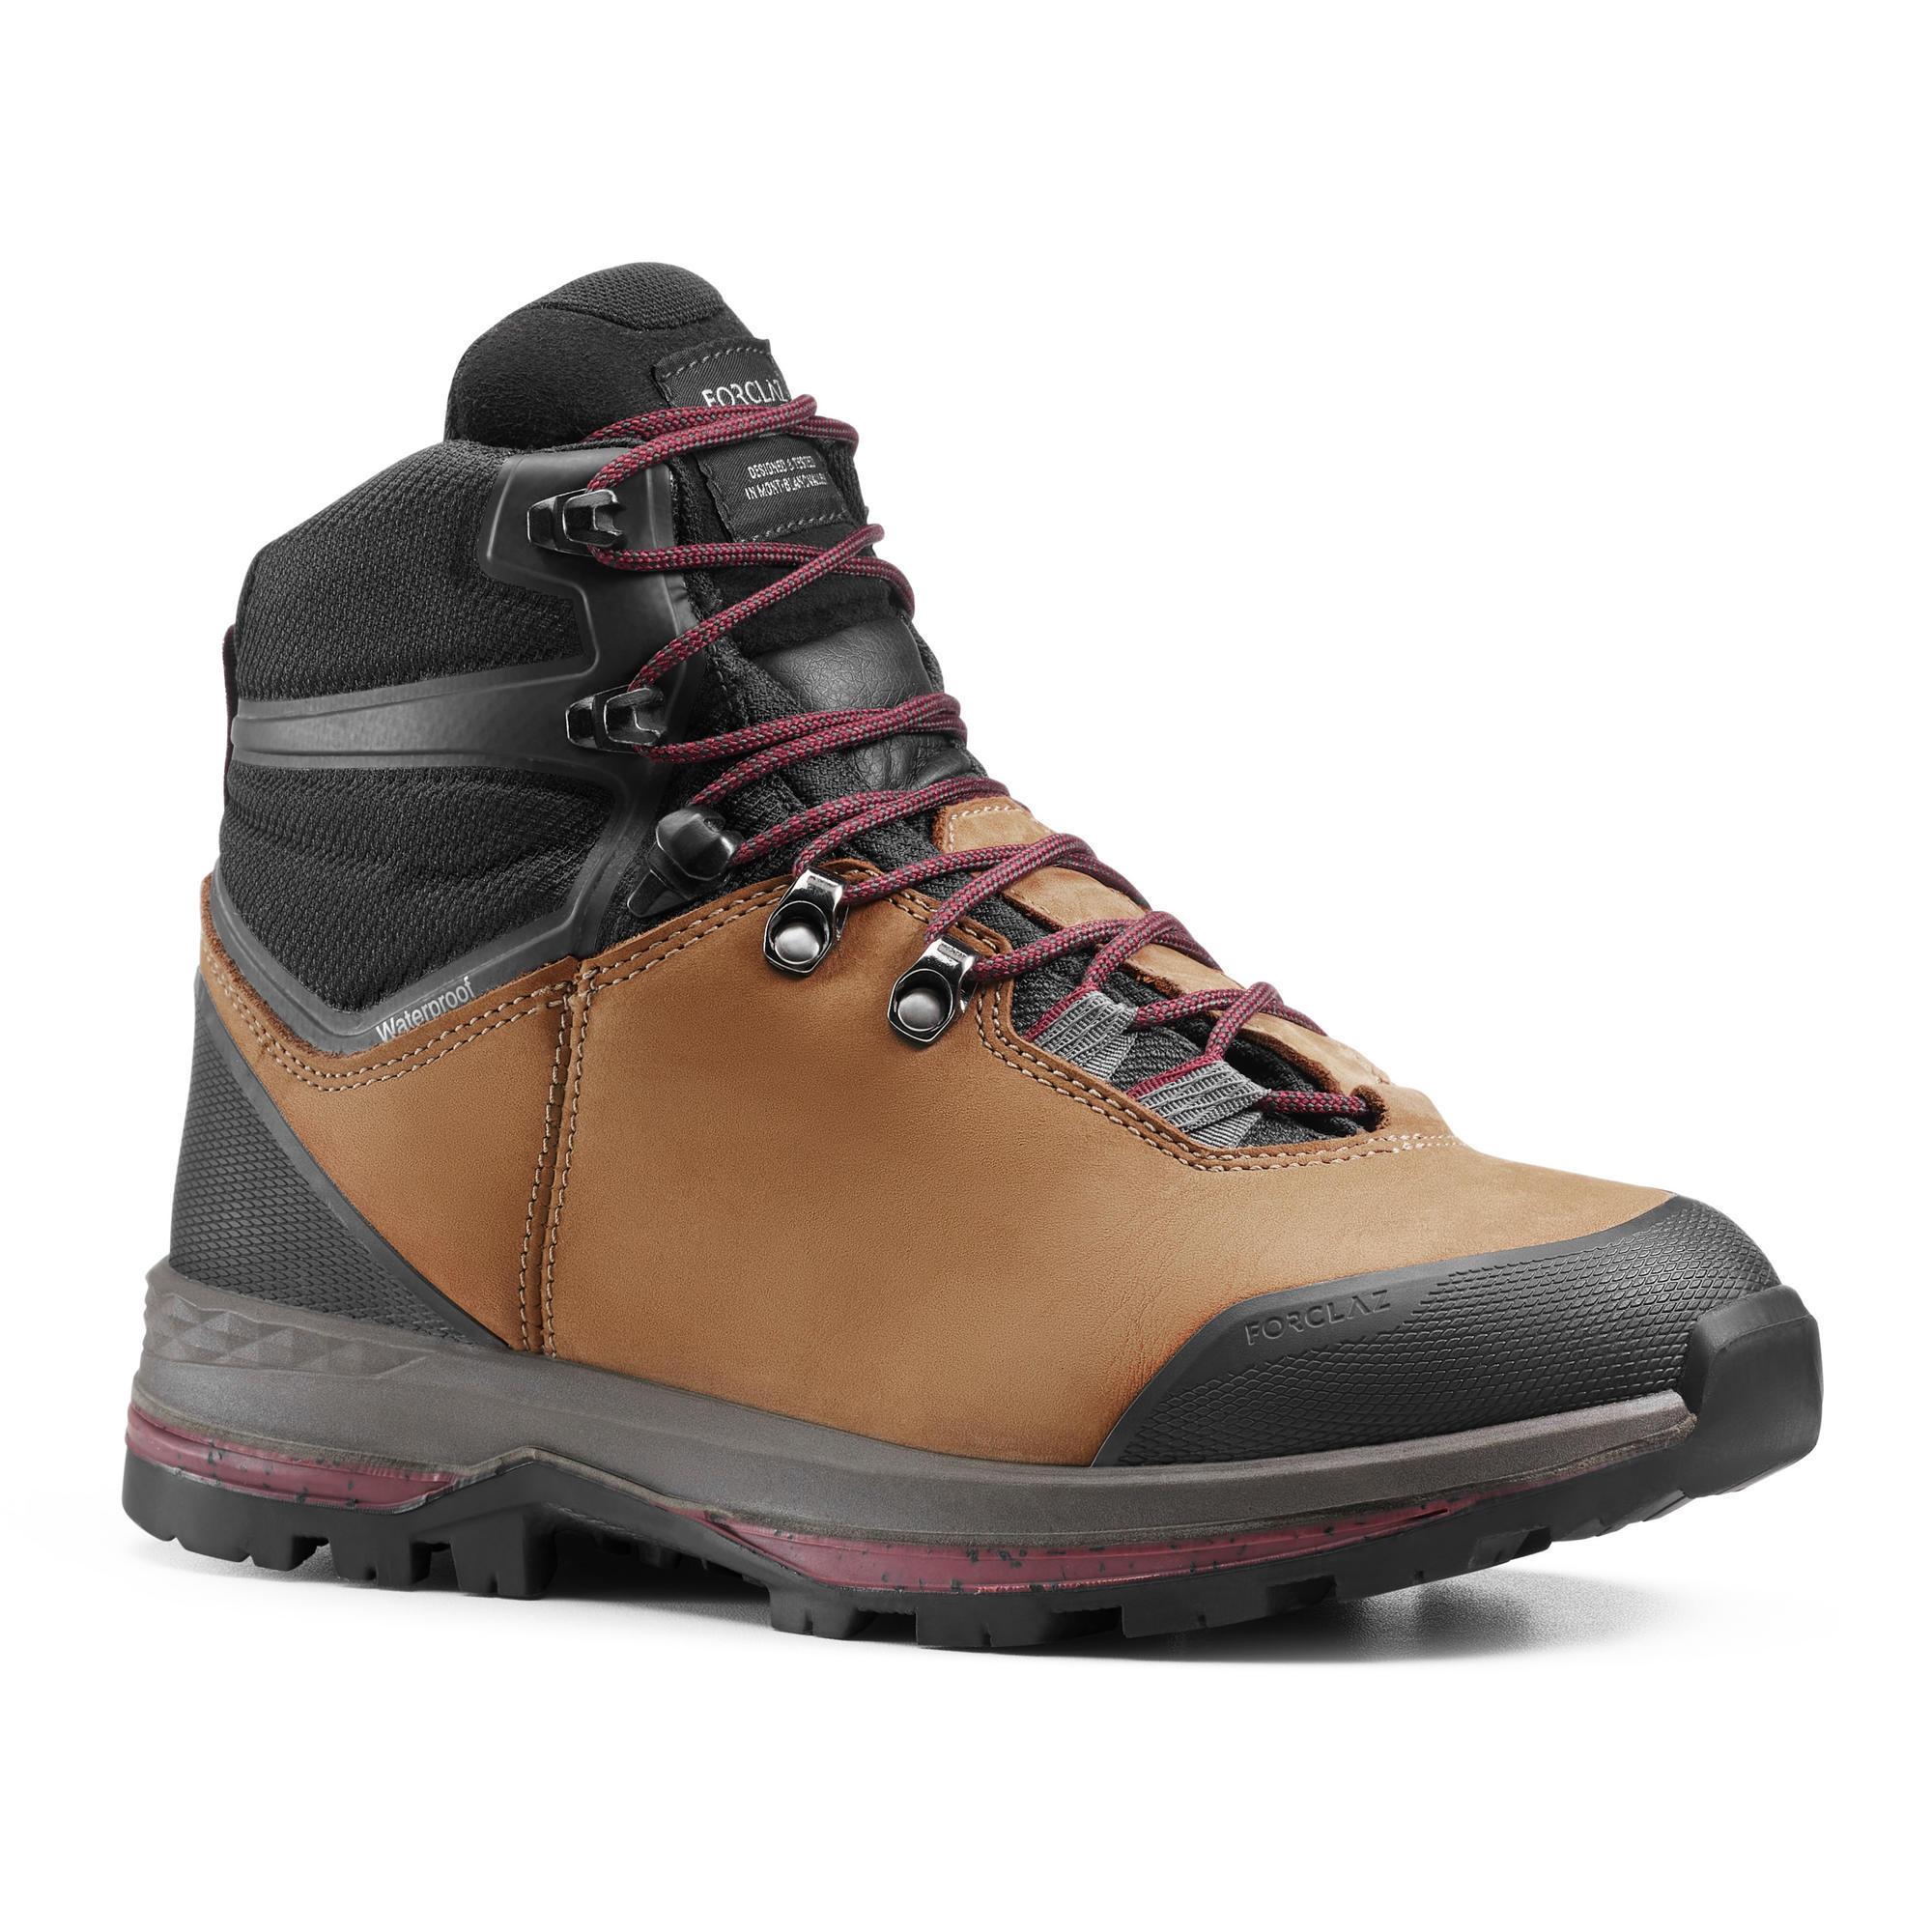 Trekkingschuhe Trek 100 Leder Damen | Schuhe > Outdoorschuhe > Trekkingschuhe | Forclaz